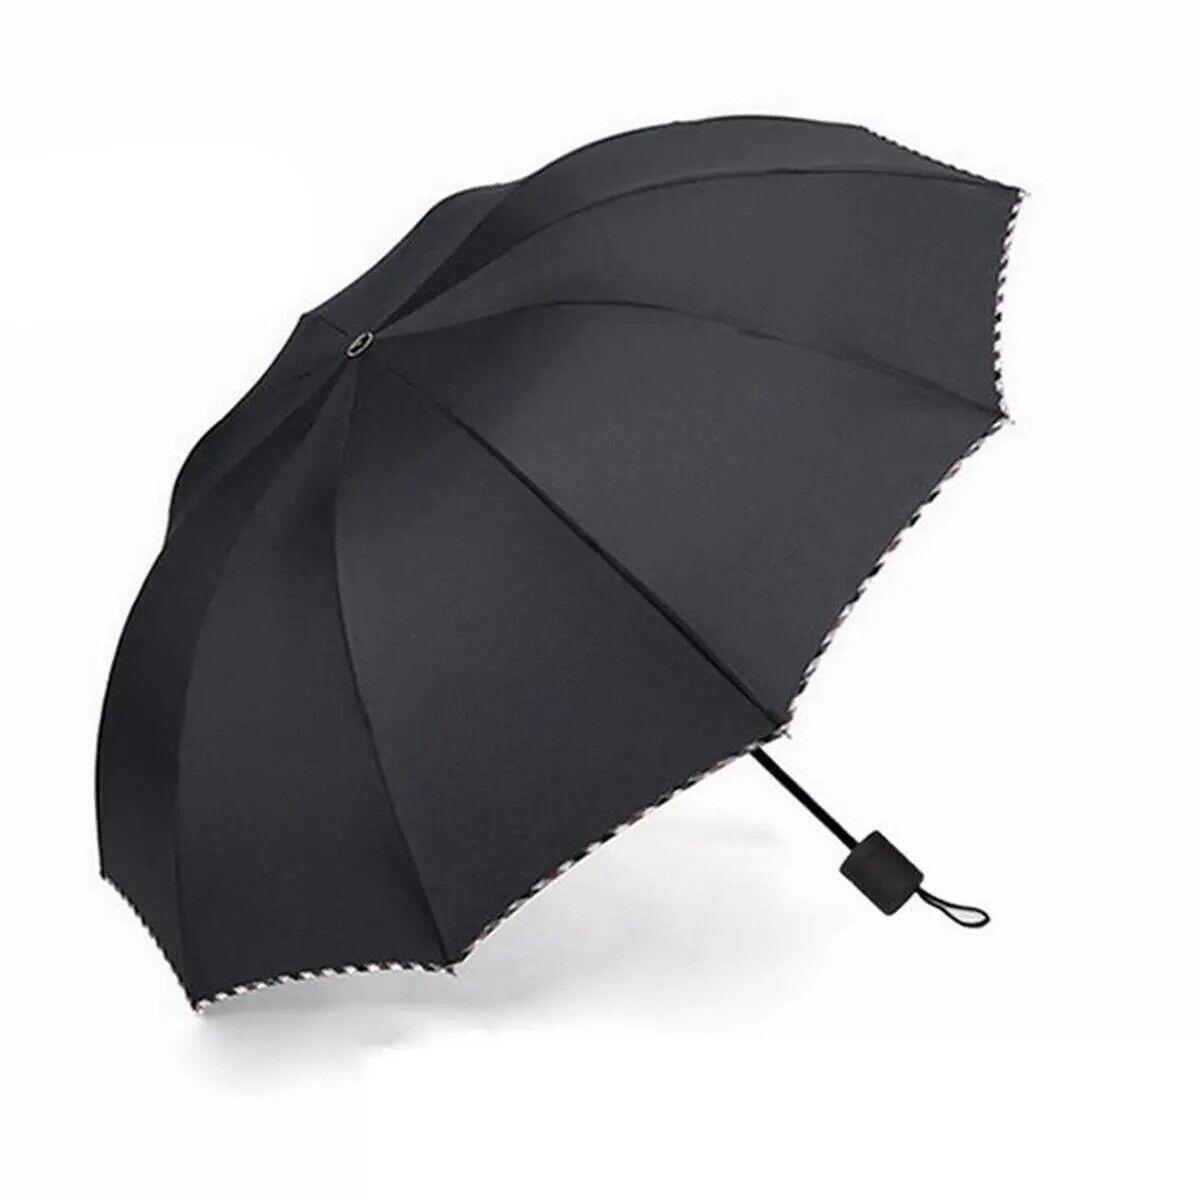 Oversize Umbrella Folding Windproof Strong Wind Rain UV Resistance Cover Black